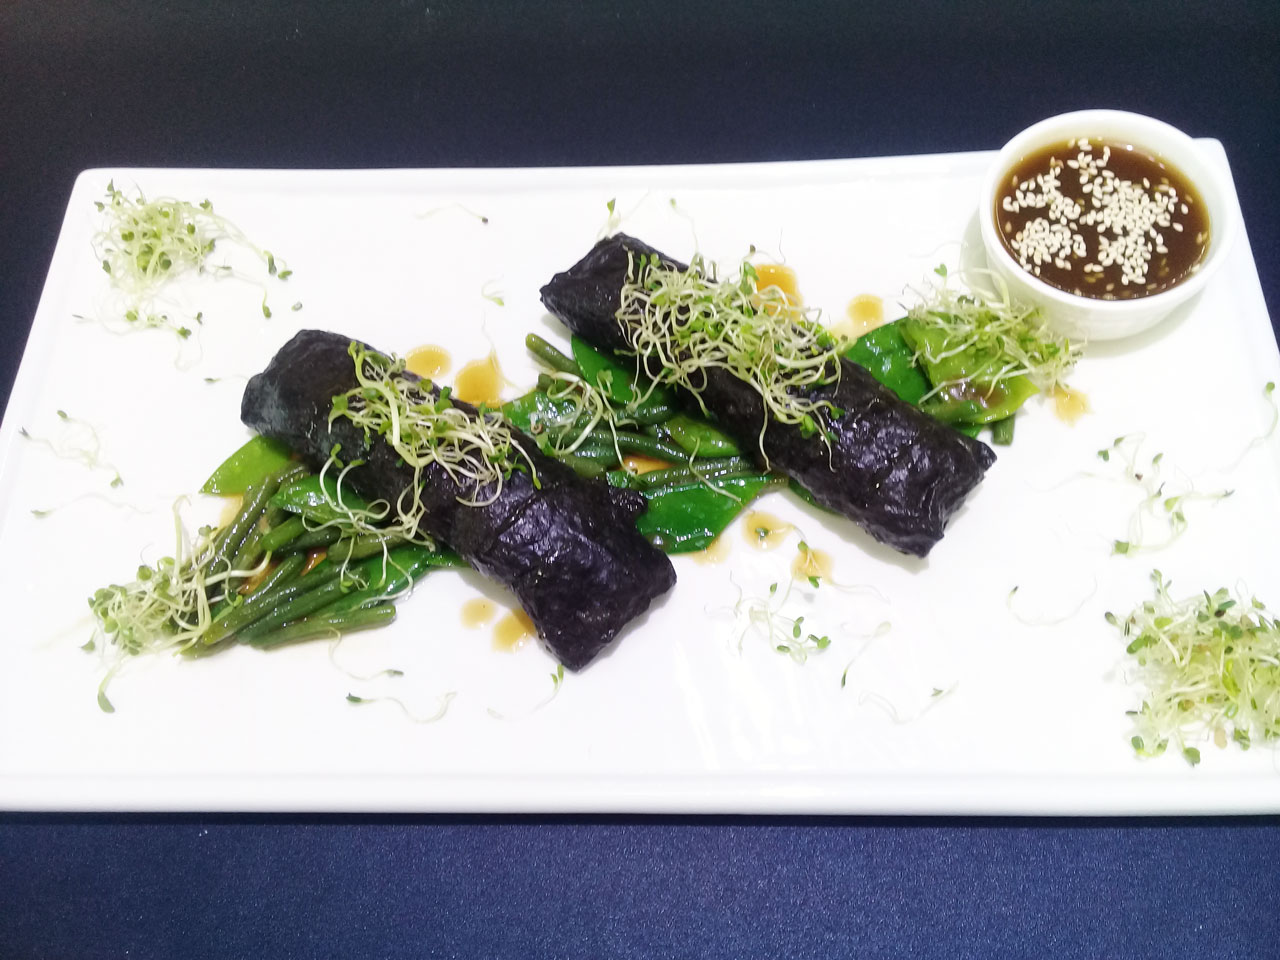 Филе дорада в водорослях нори - ресторан Аннам Брахма в Оренбурге